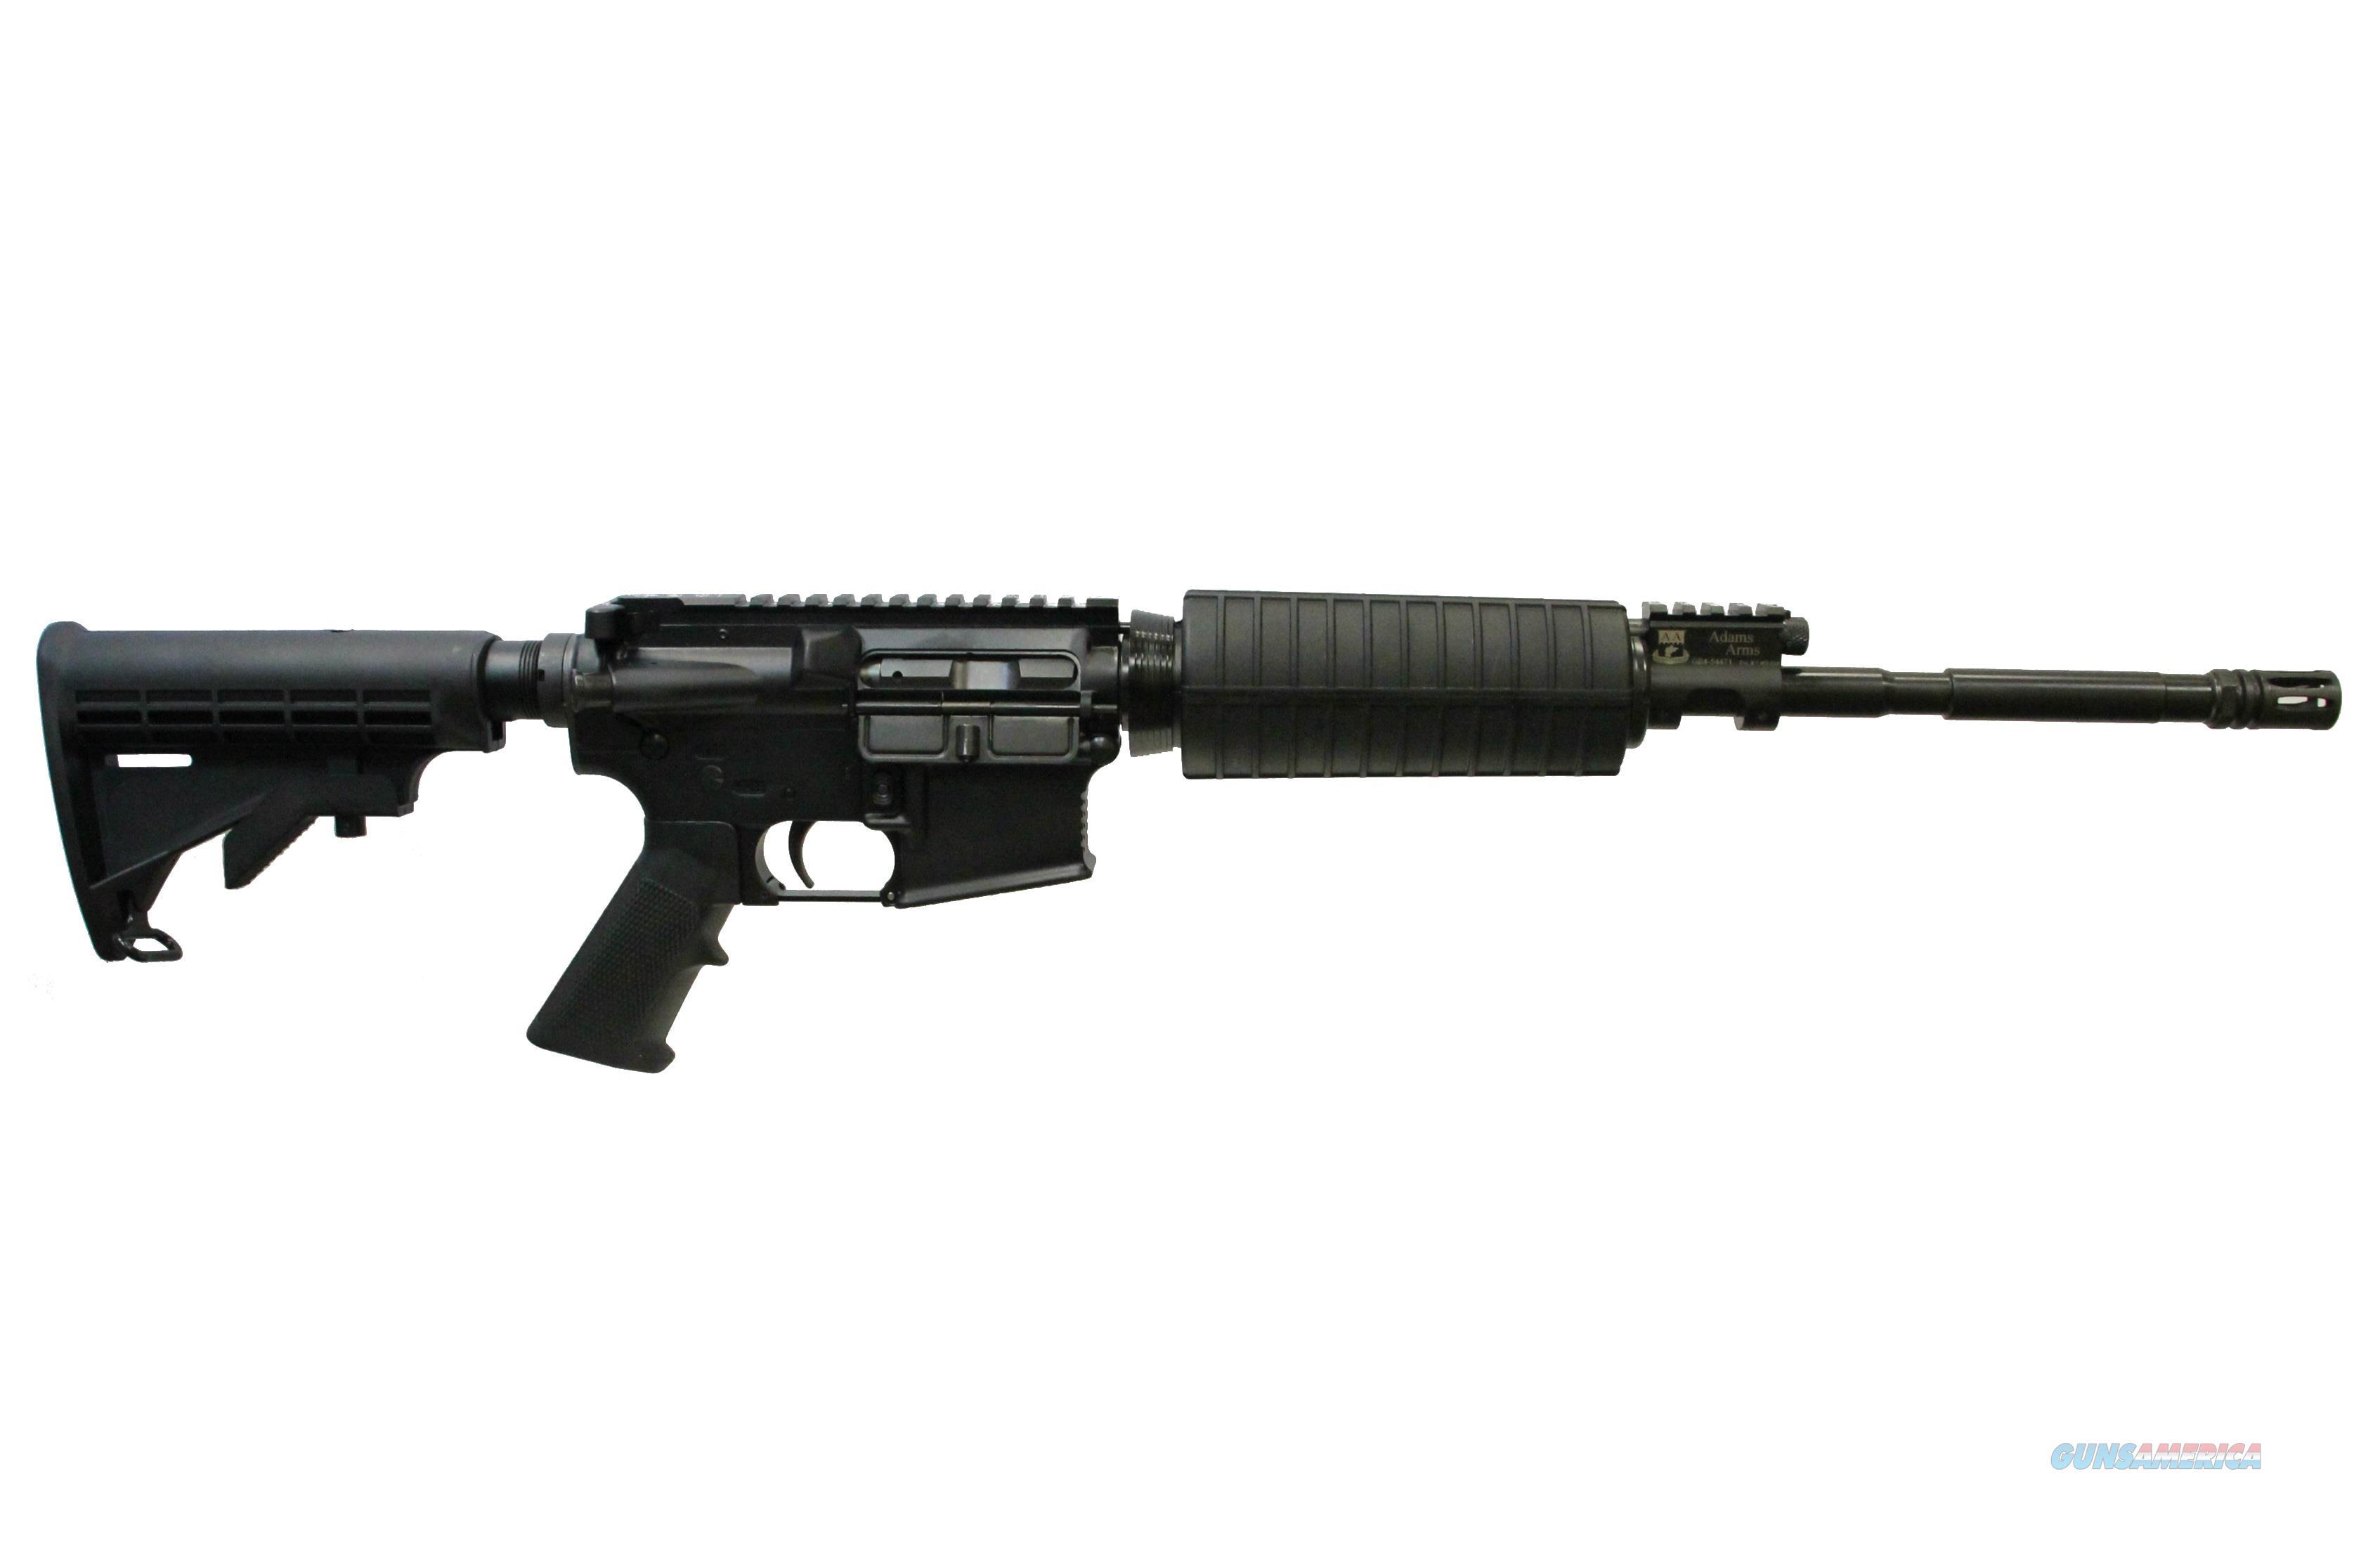 "ADAMS ARMS AGENCY BASE PISTON AR-15 AR15 16"" BLACK SKU: FGAA-001155-R  Guns > Rifles > AR-15 Rifles - Small Manufacturers > Complete Rifle"